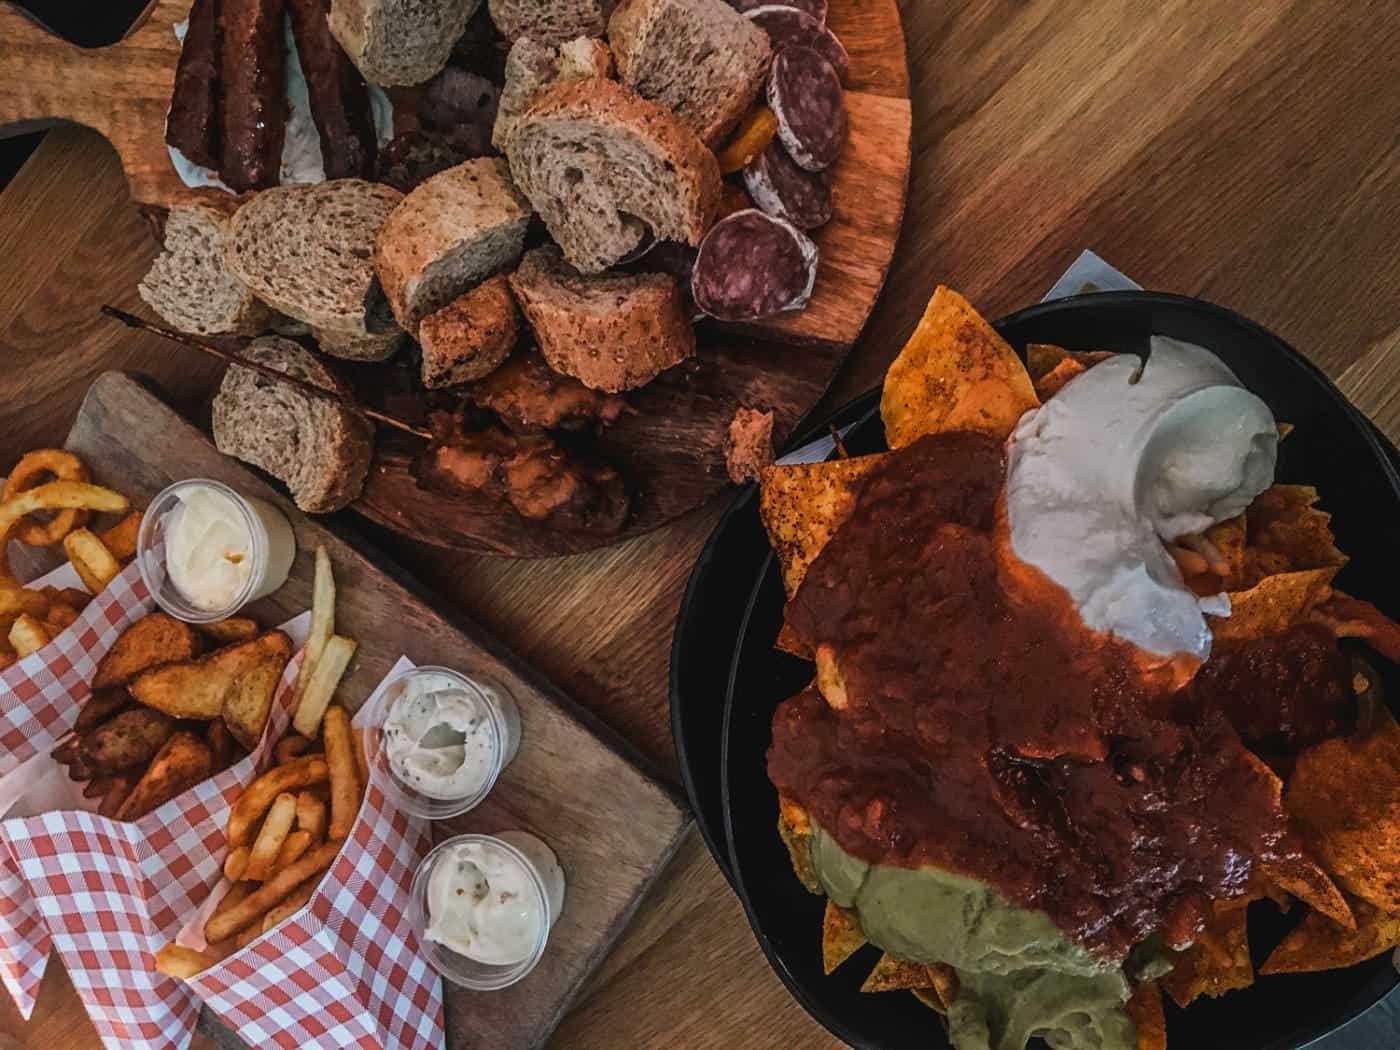 Amsterdam food platter